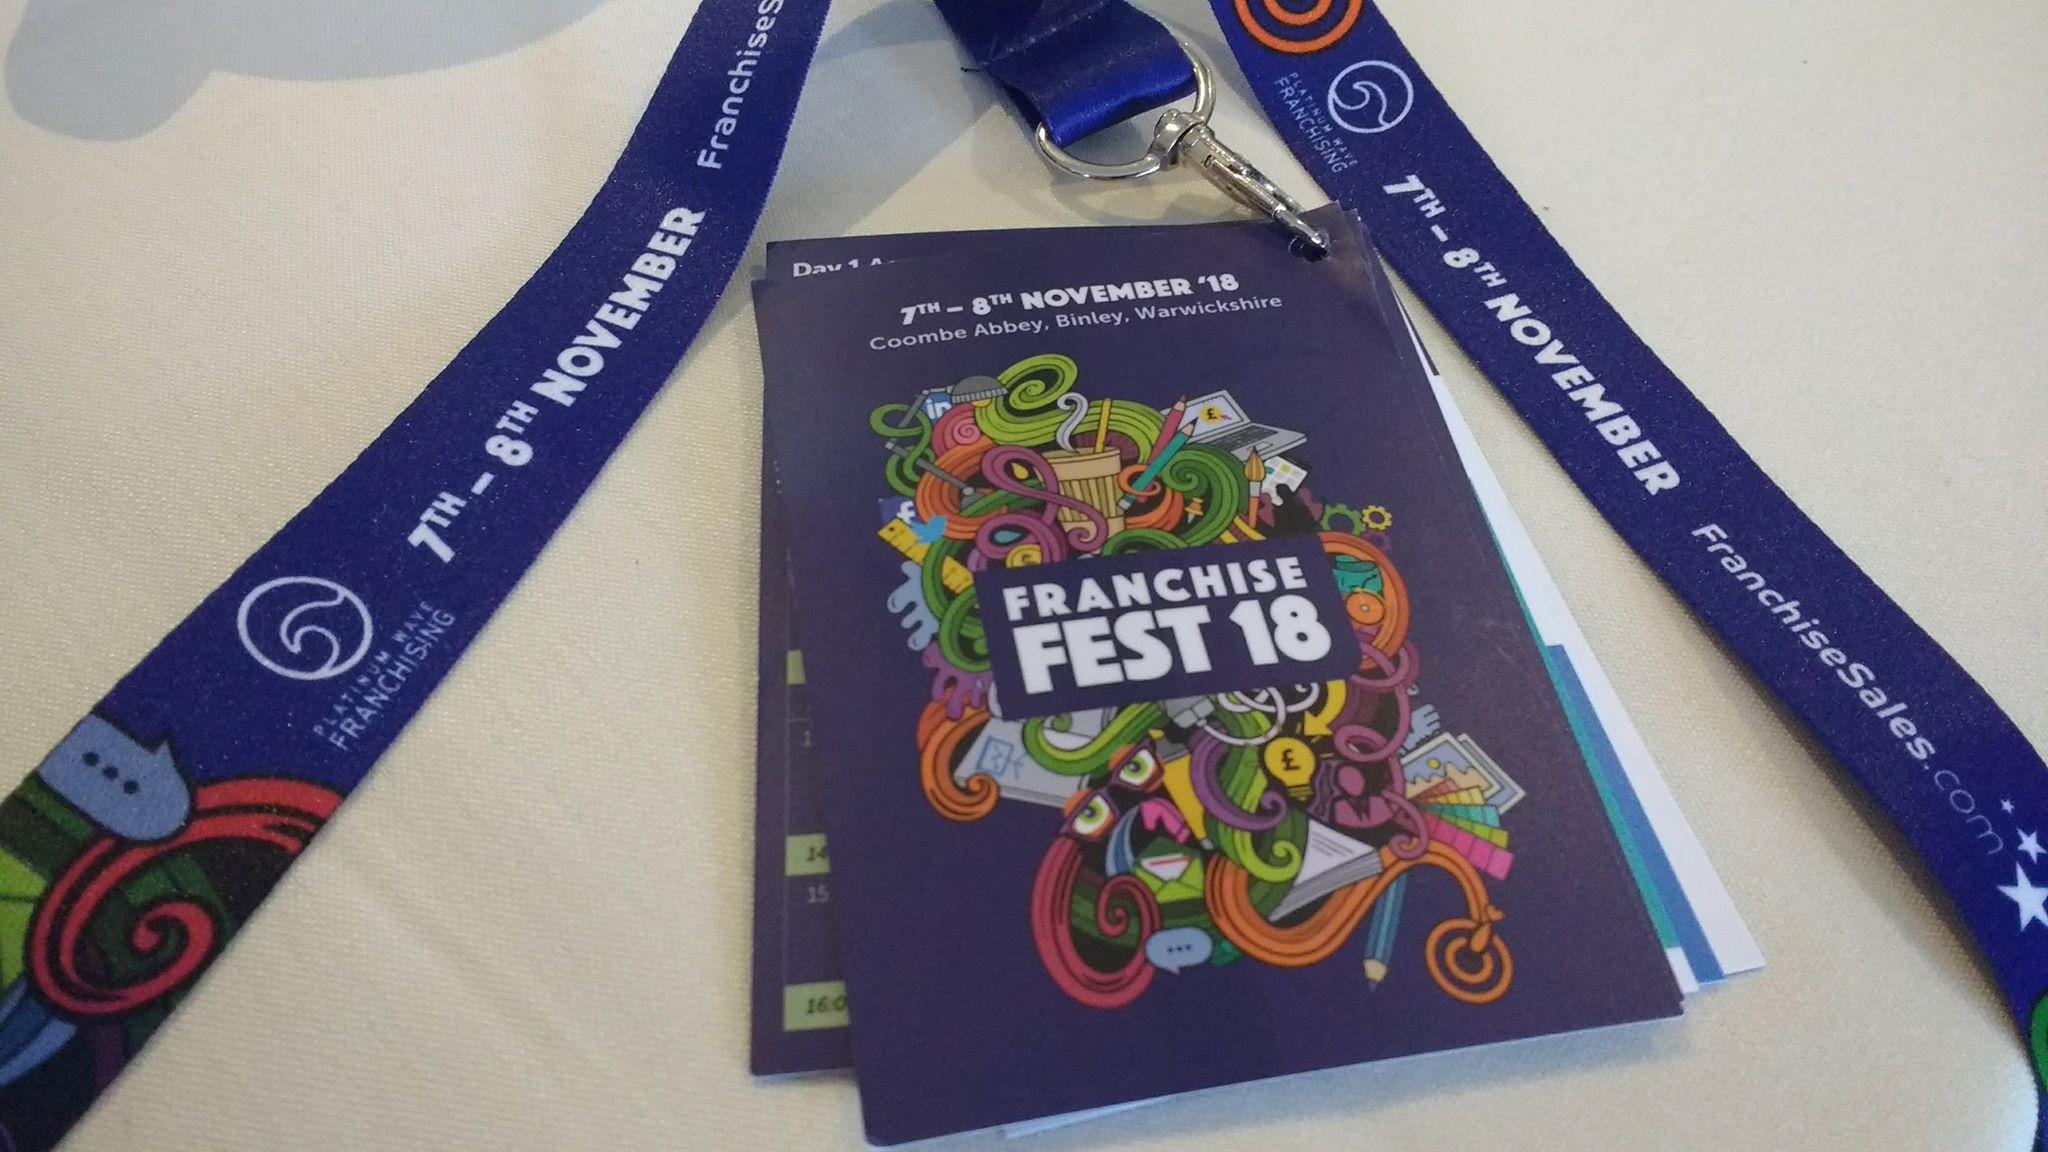 Franchise Fest 2018